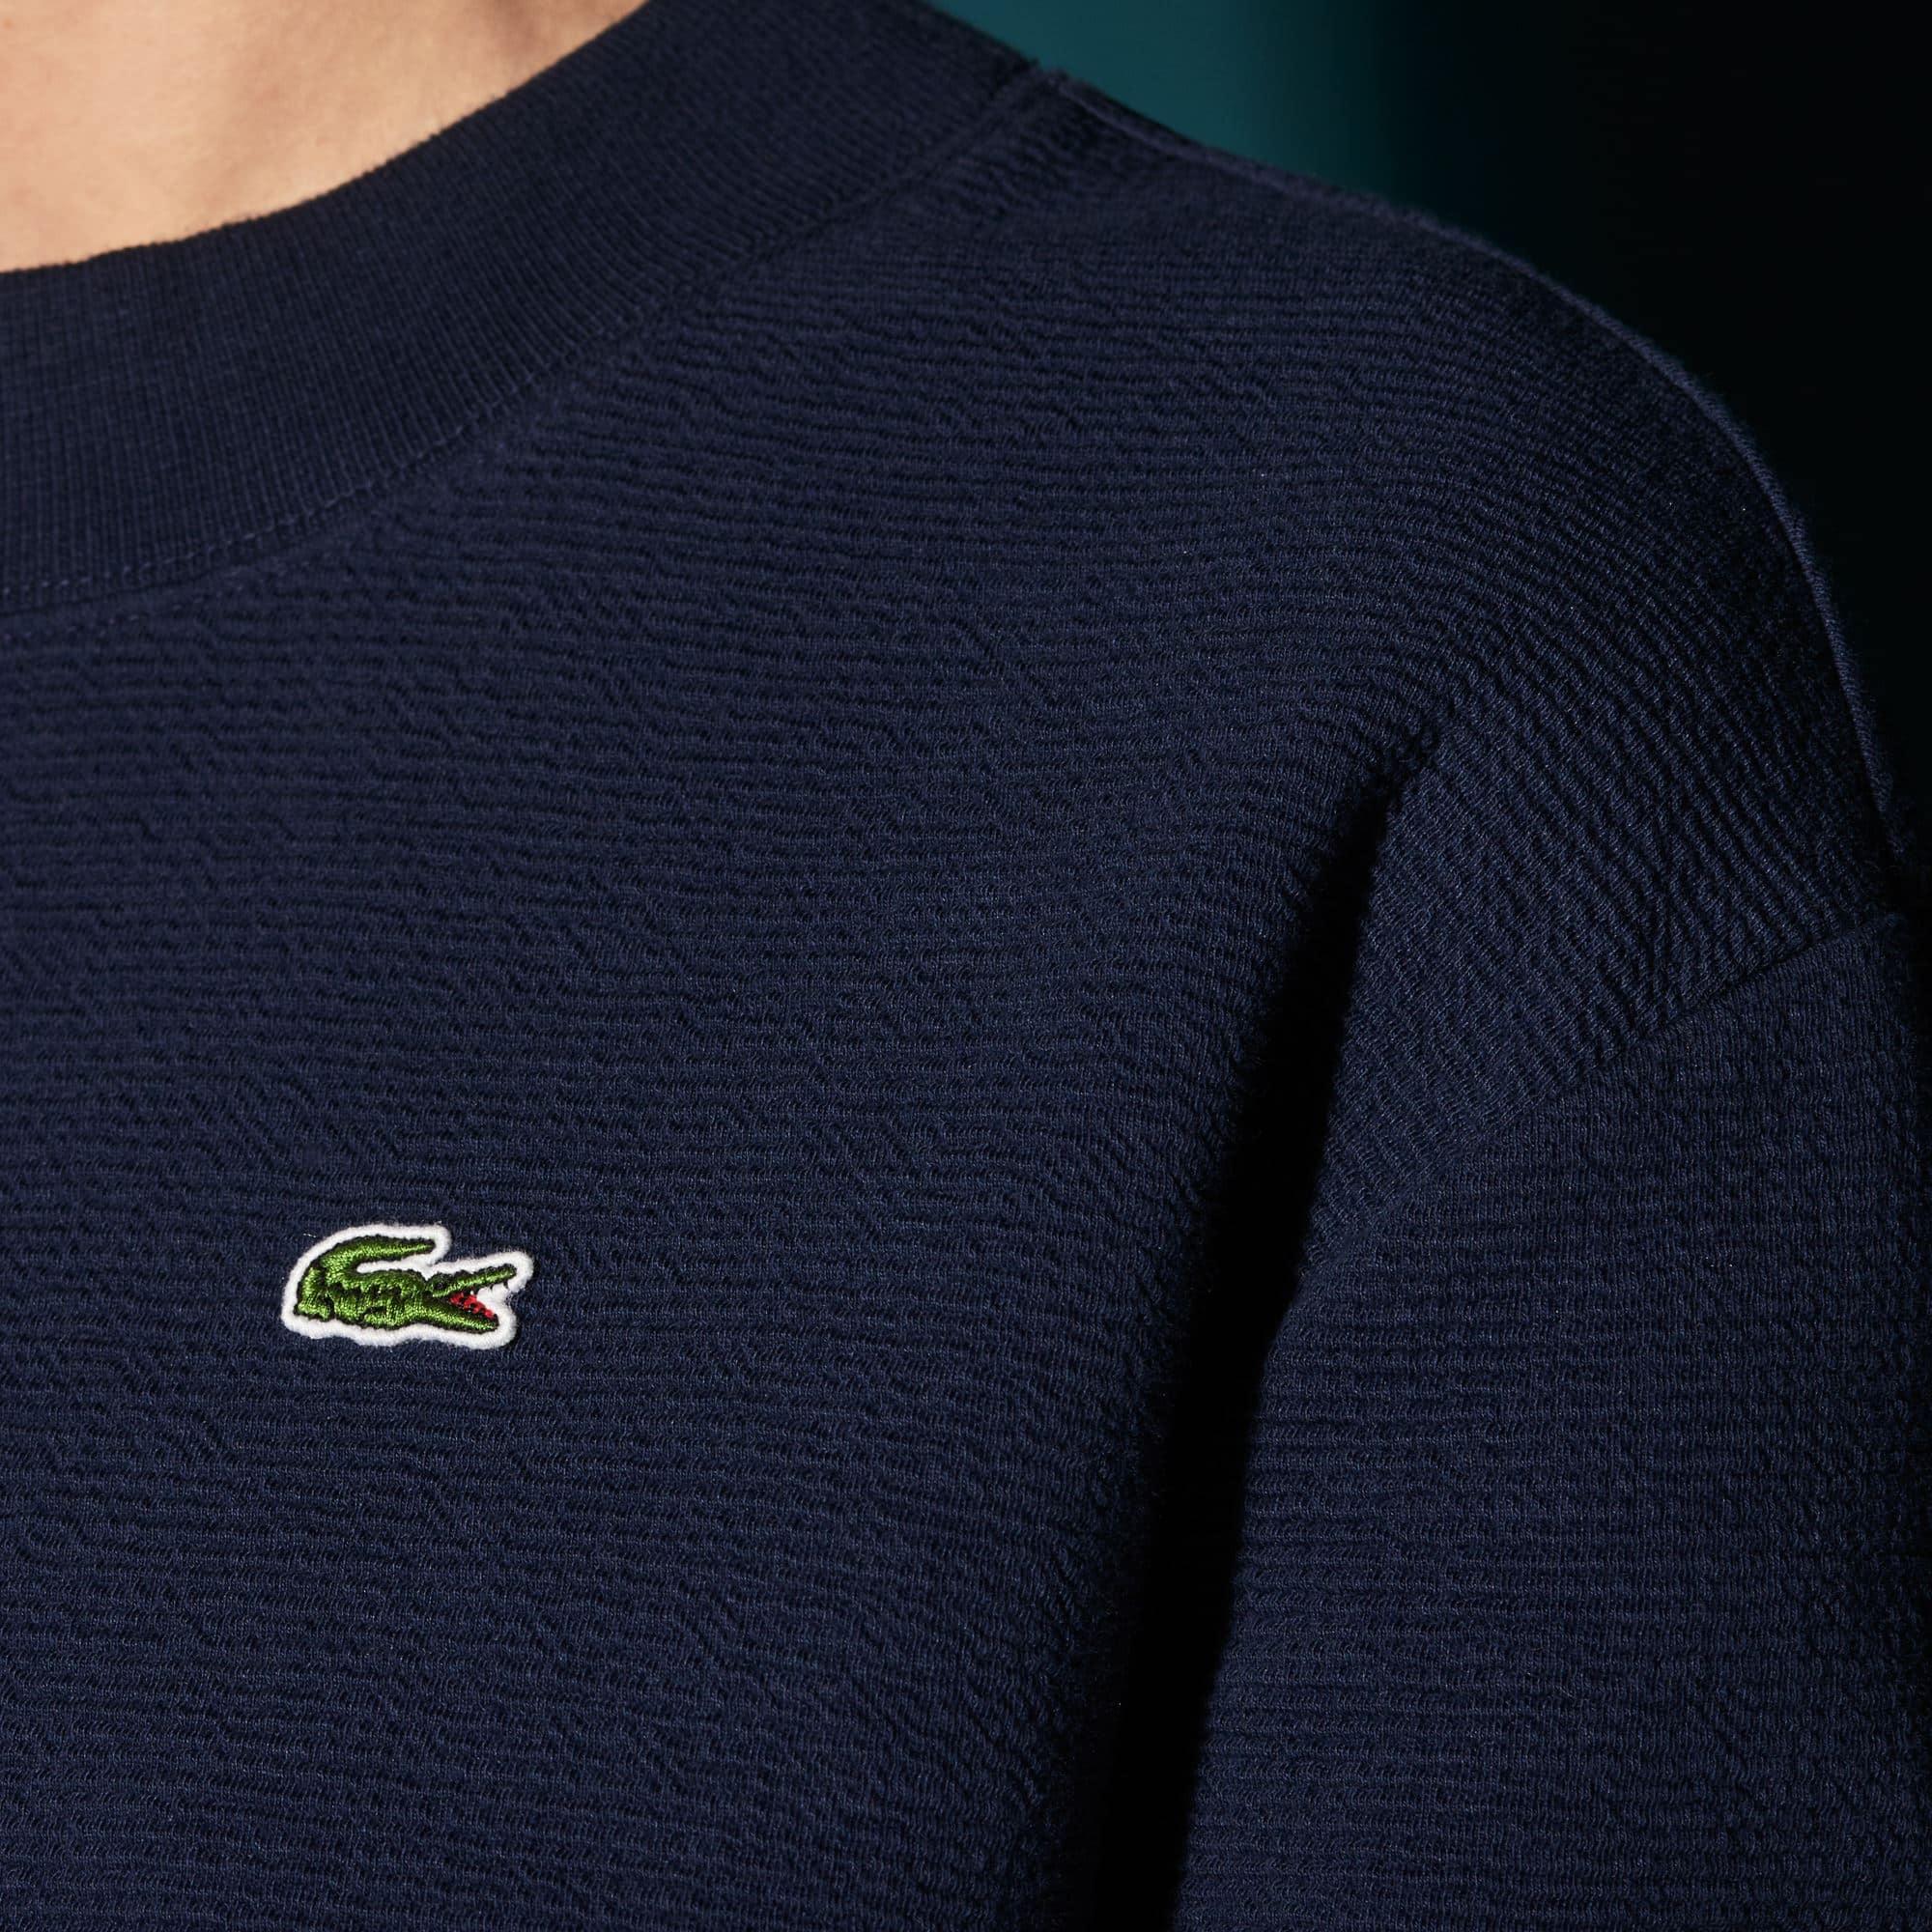 Damen LACOSTE SPORT Fleece Tennis-Sweatshirt mit Wabenstruktur